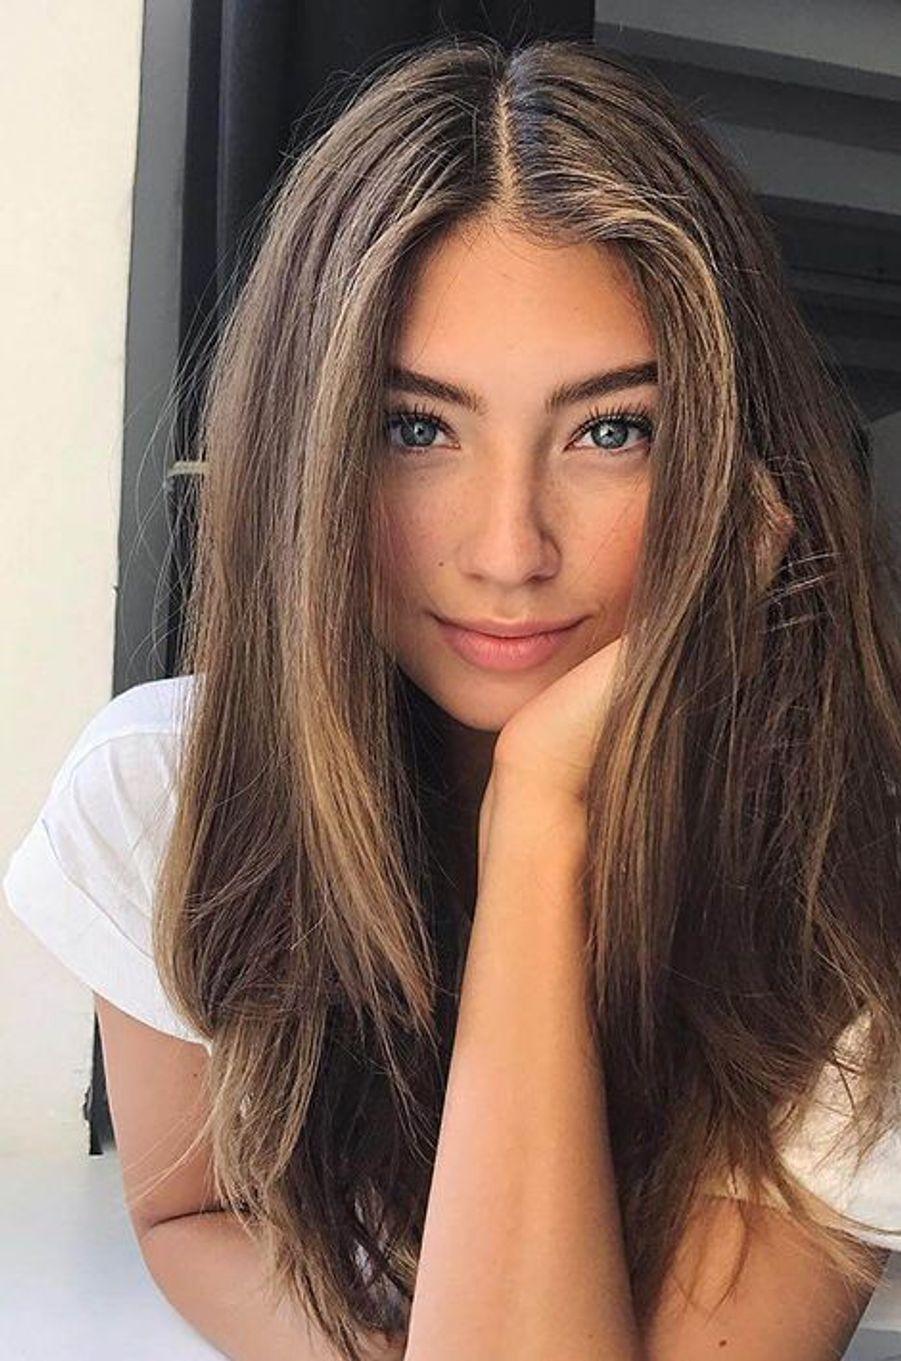 Qui est Lorena Rae, la nouvelle amie de Leonardo DiCaprio ?